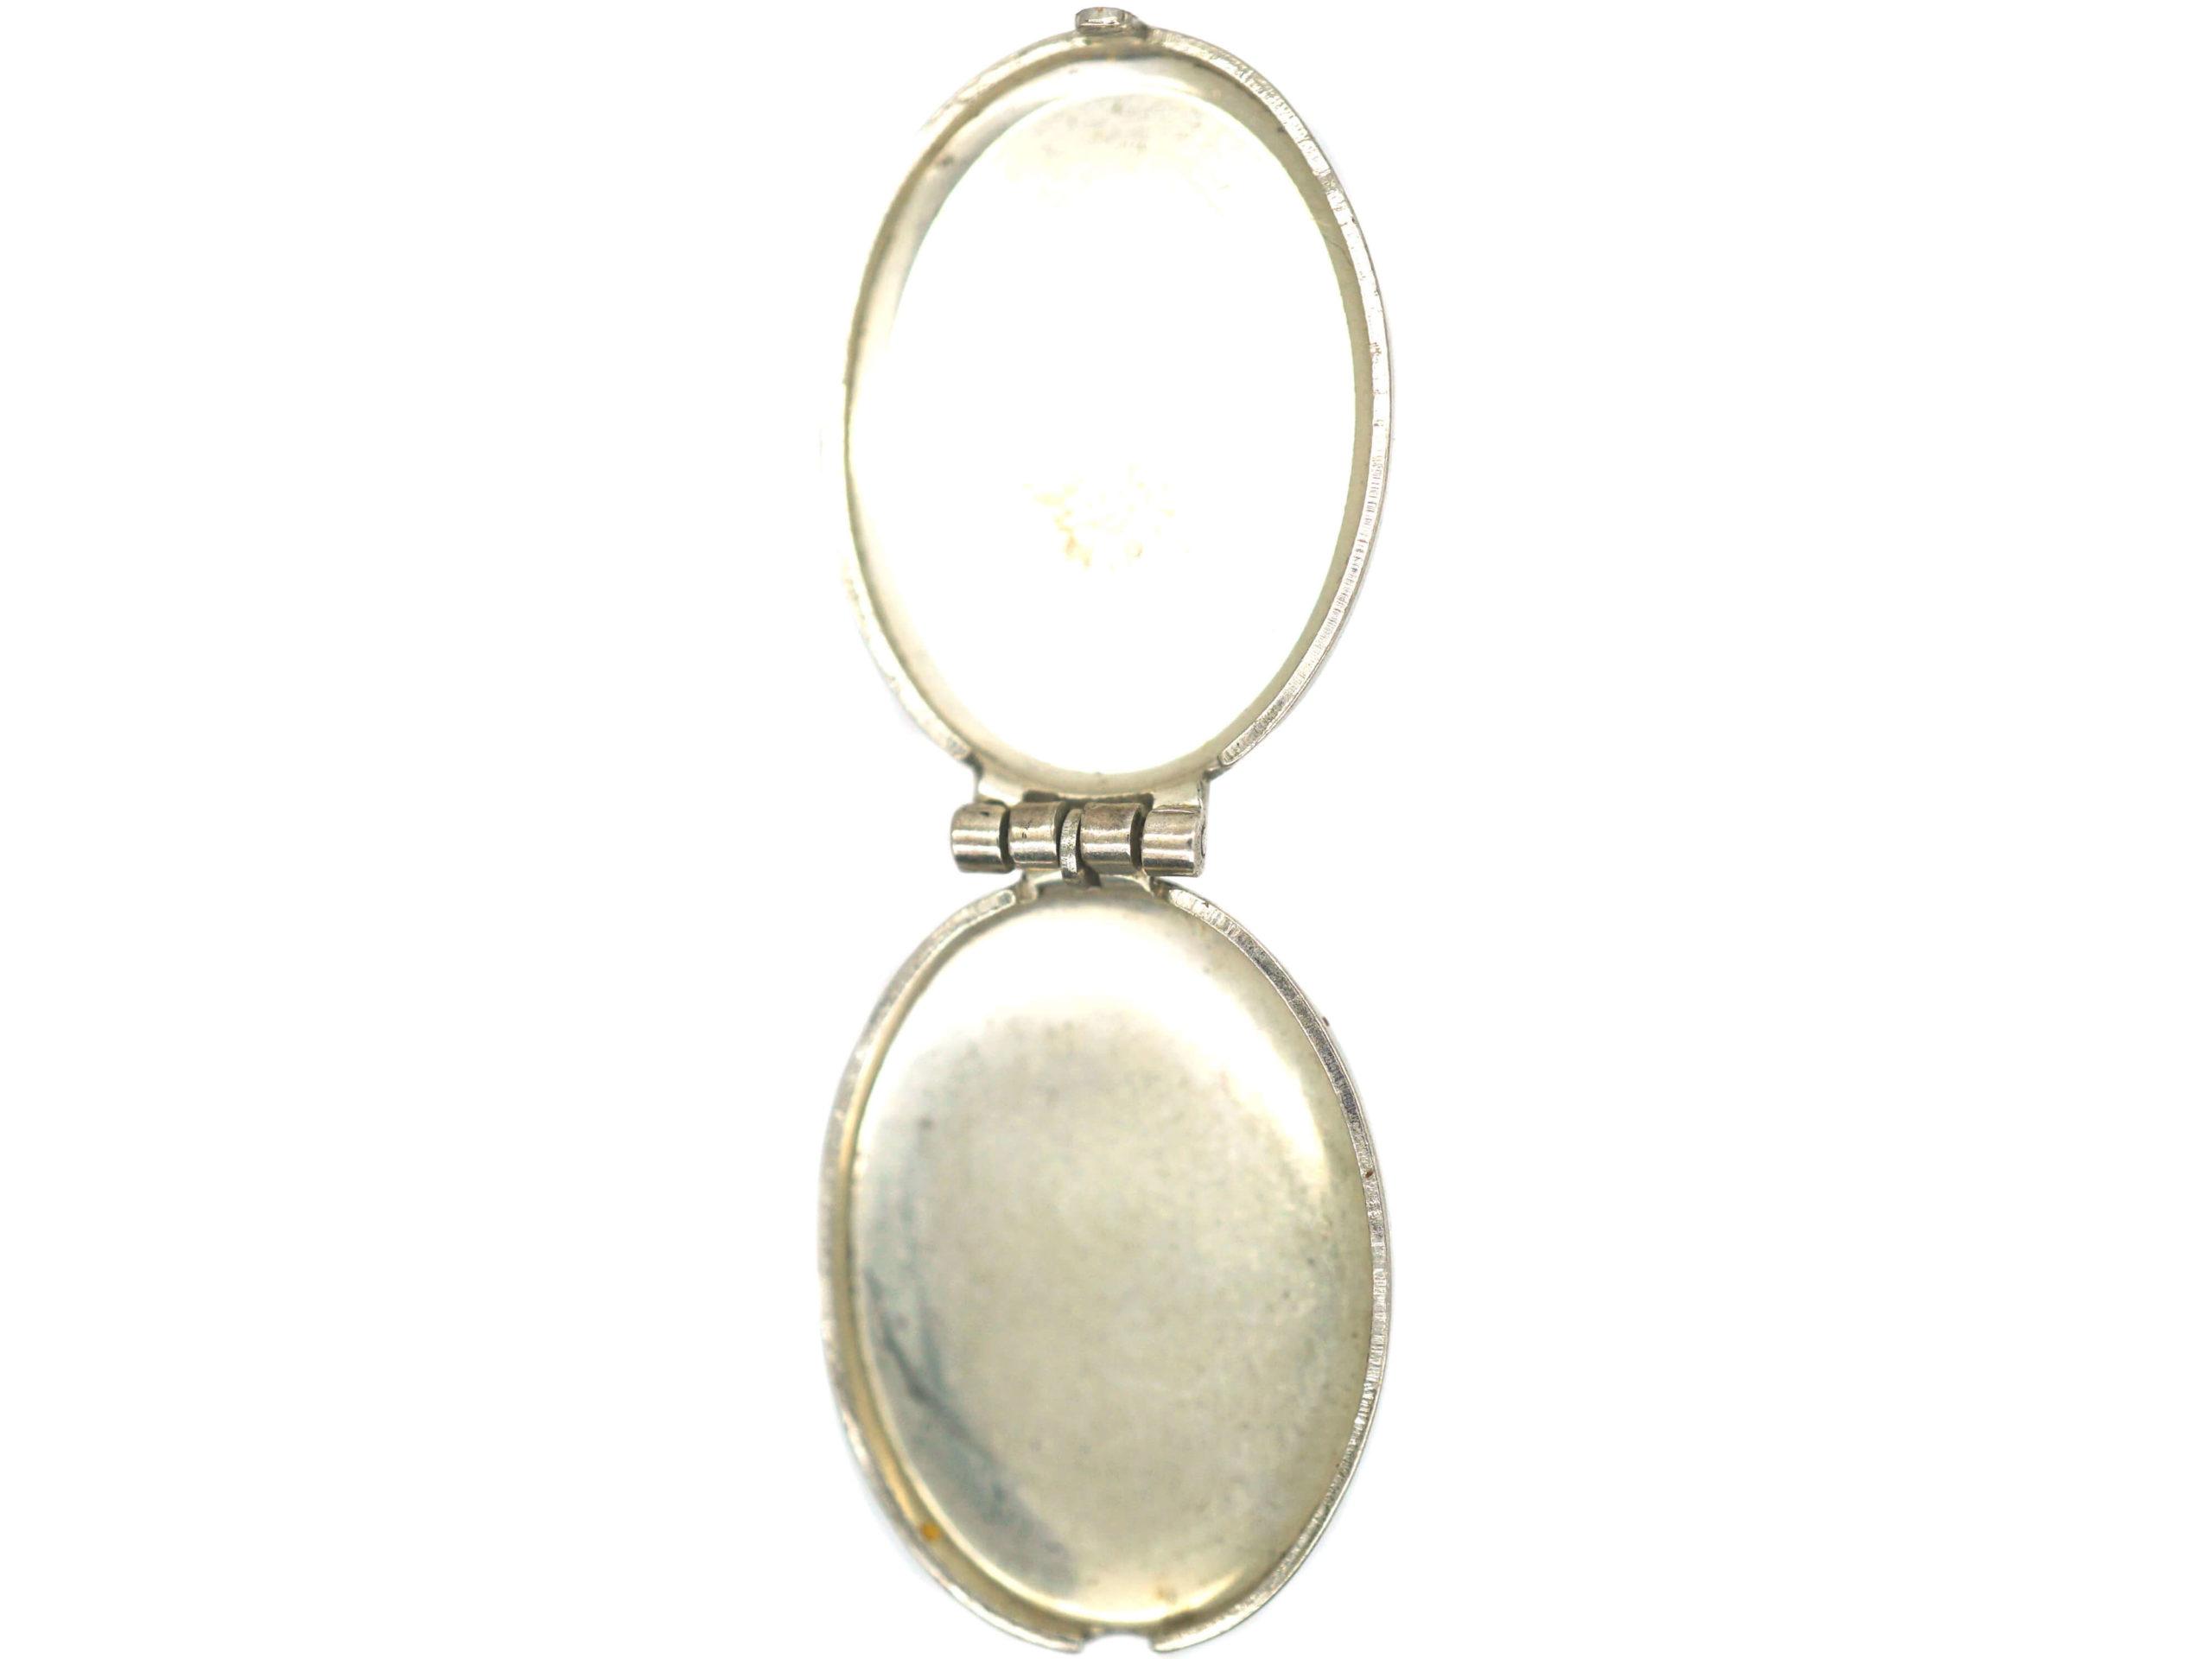 Small Silver Oval Locket with Sunburst Design